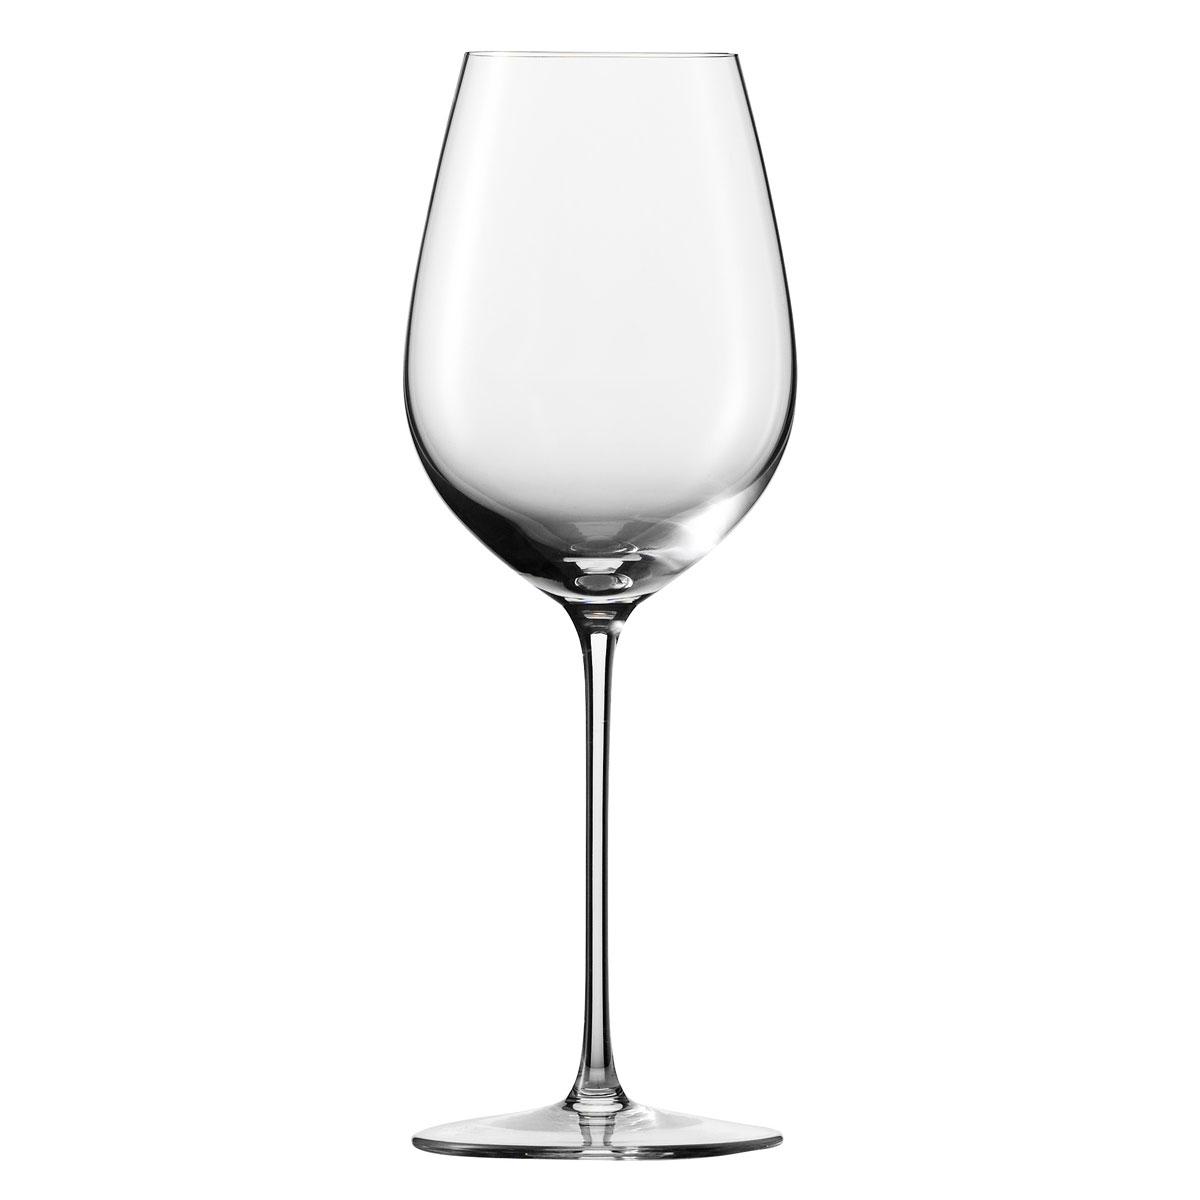 Schott Zwiesel Tritan Crystal, 1872 Enoteca Chardonnay, Single